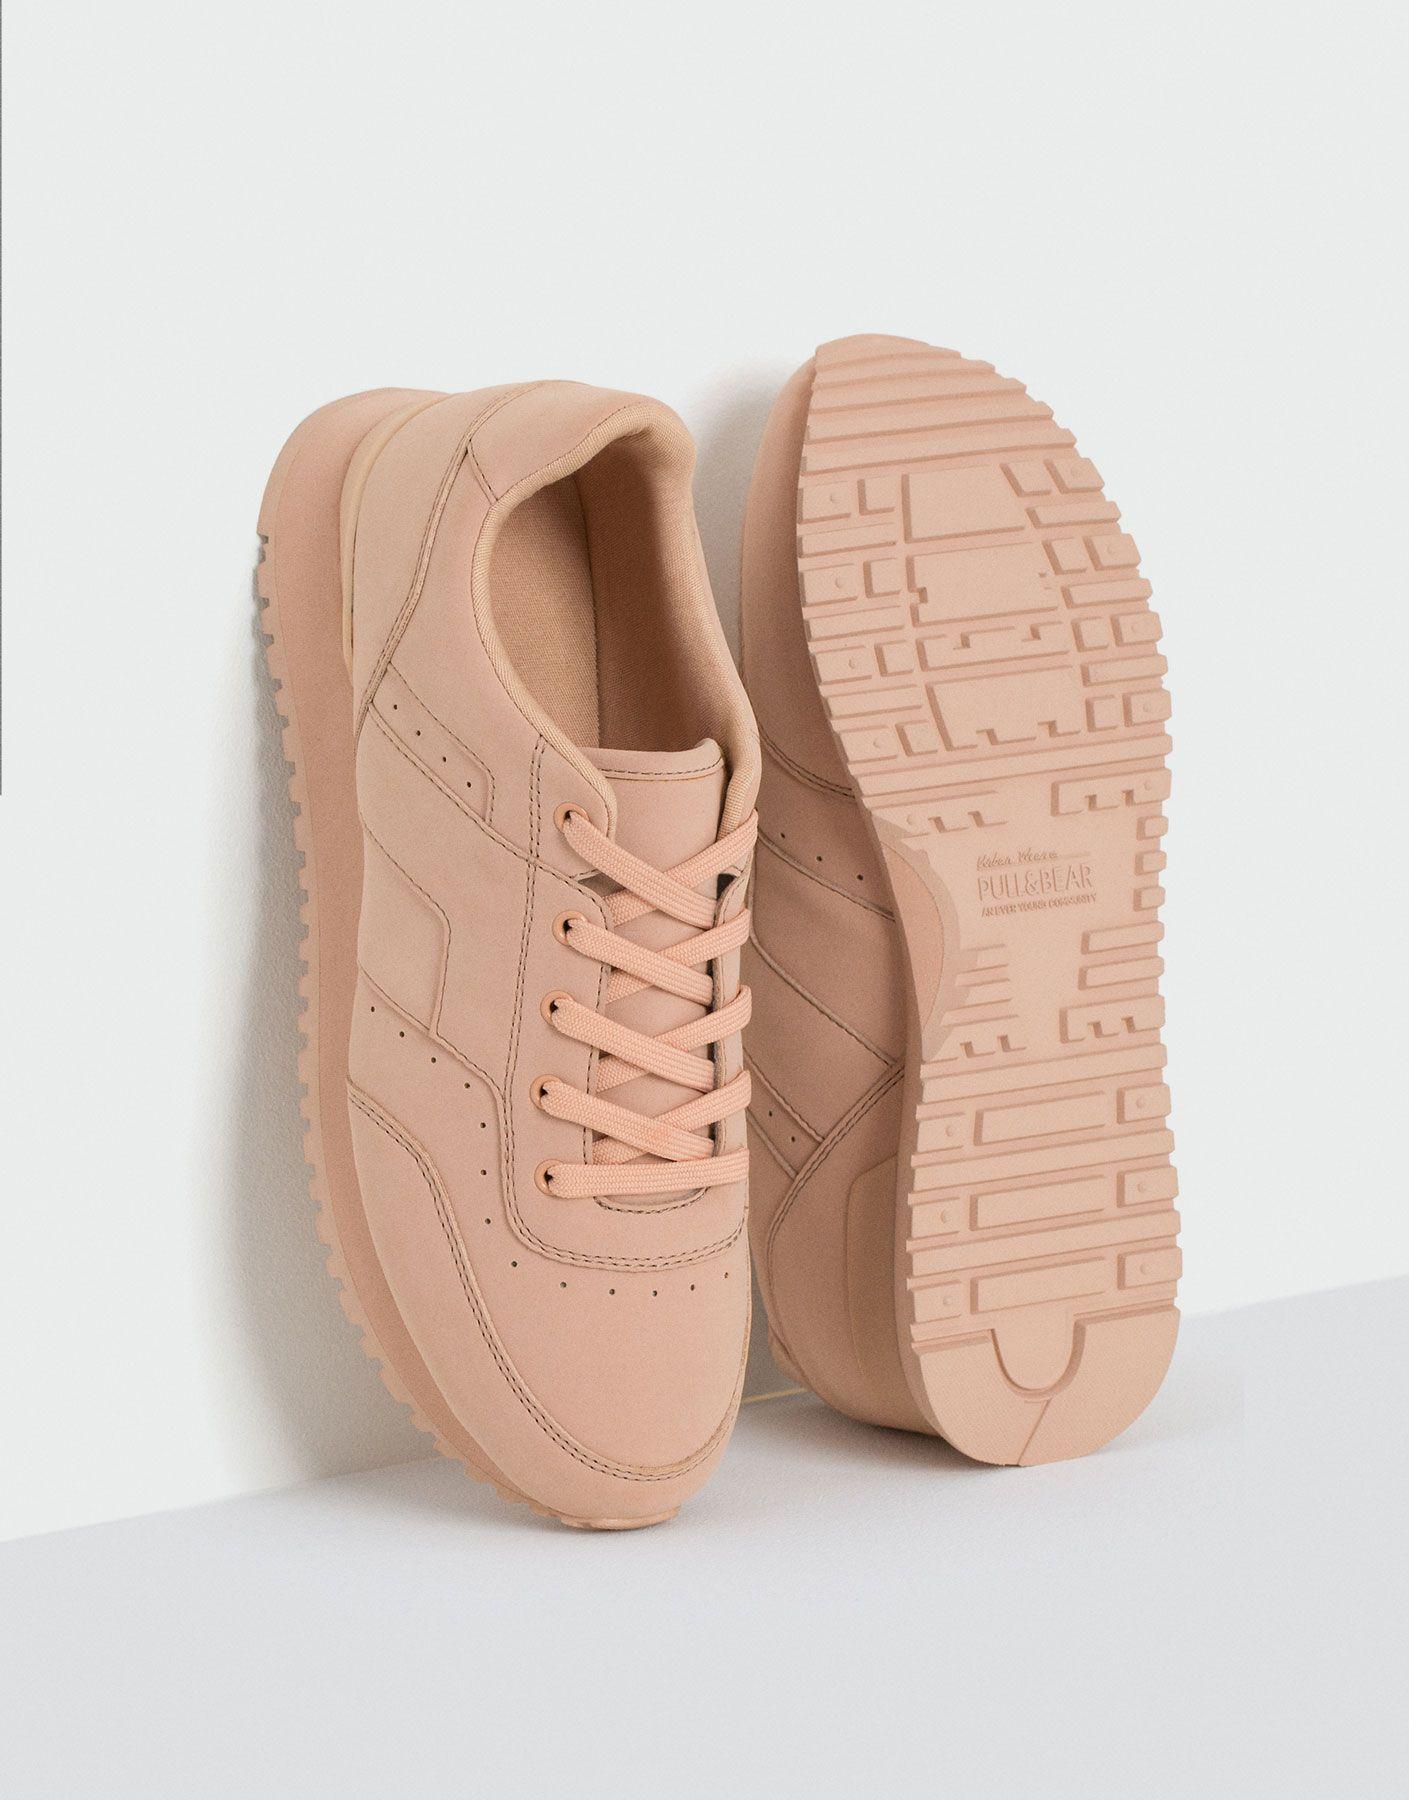 Modischer Jogging Sportschuhe Schuhe Damen Pull Bear Deutschland Latest Shoes Baby Shoes Sneakers